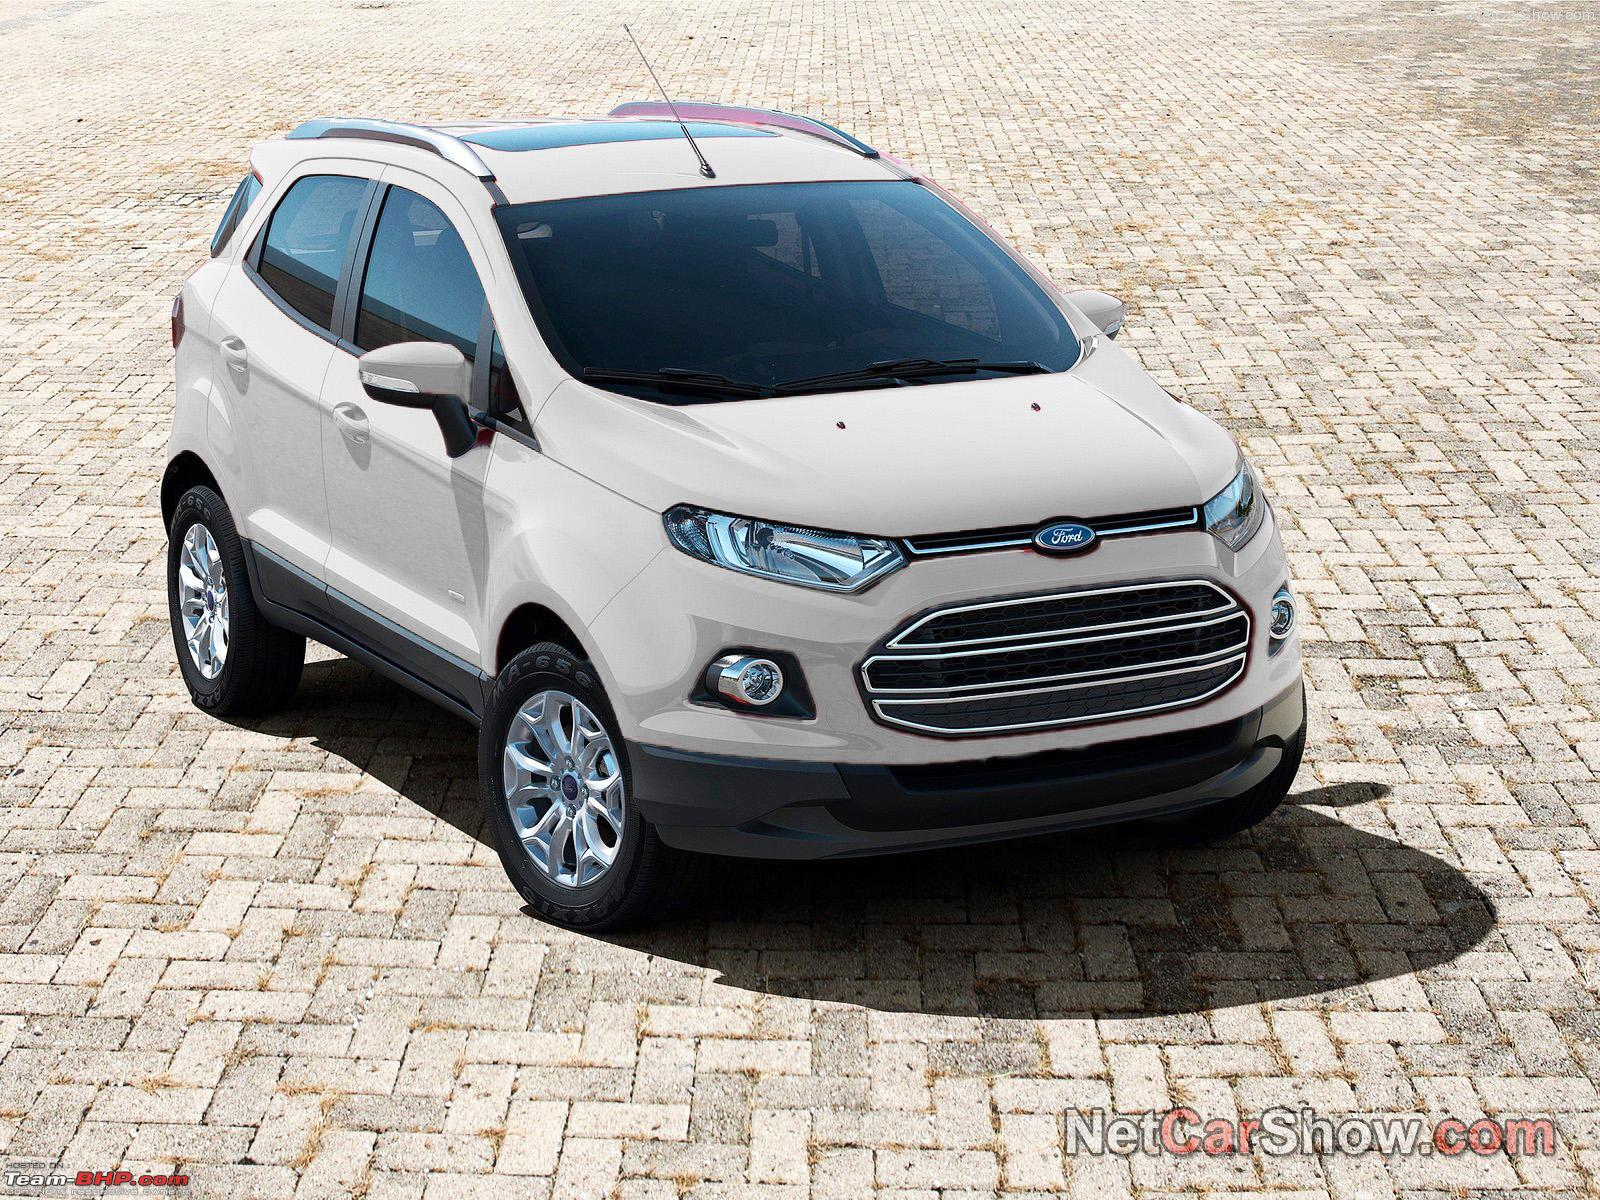 Image Result For Ford Ecosport Wallpaper